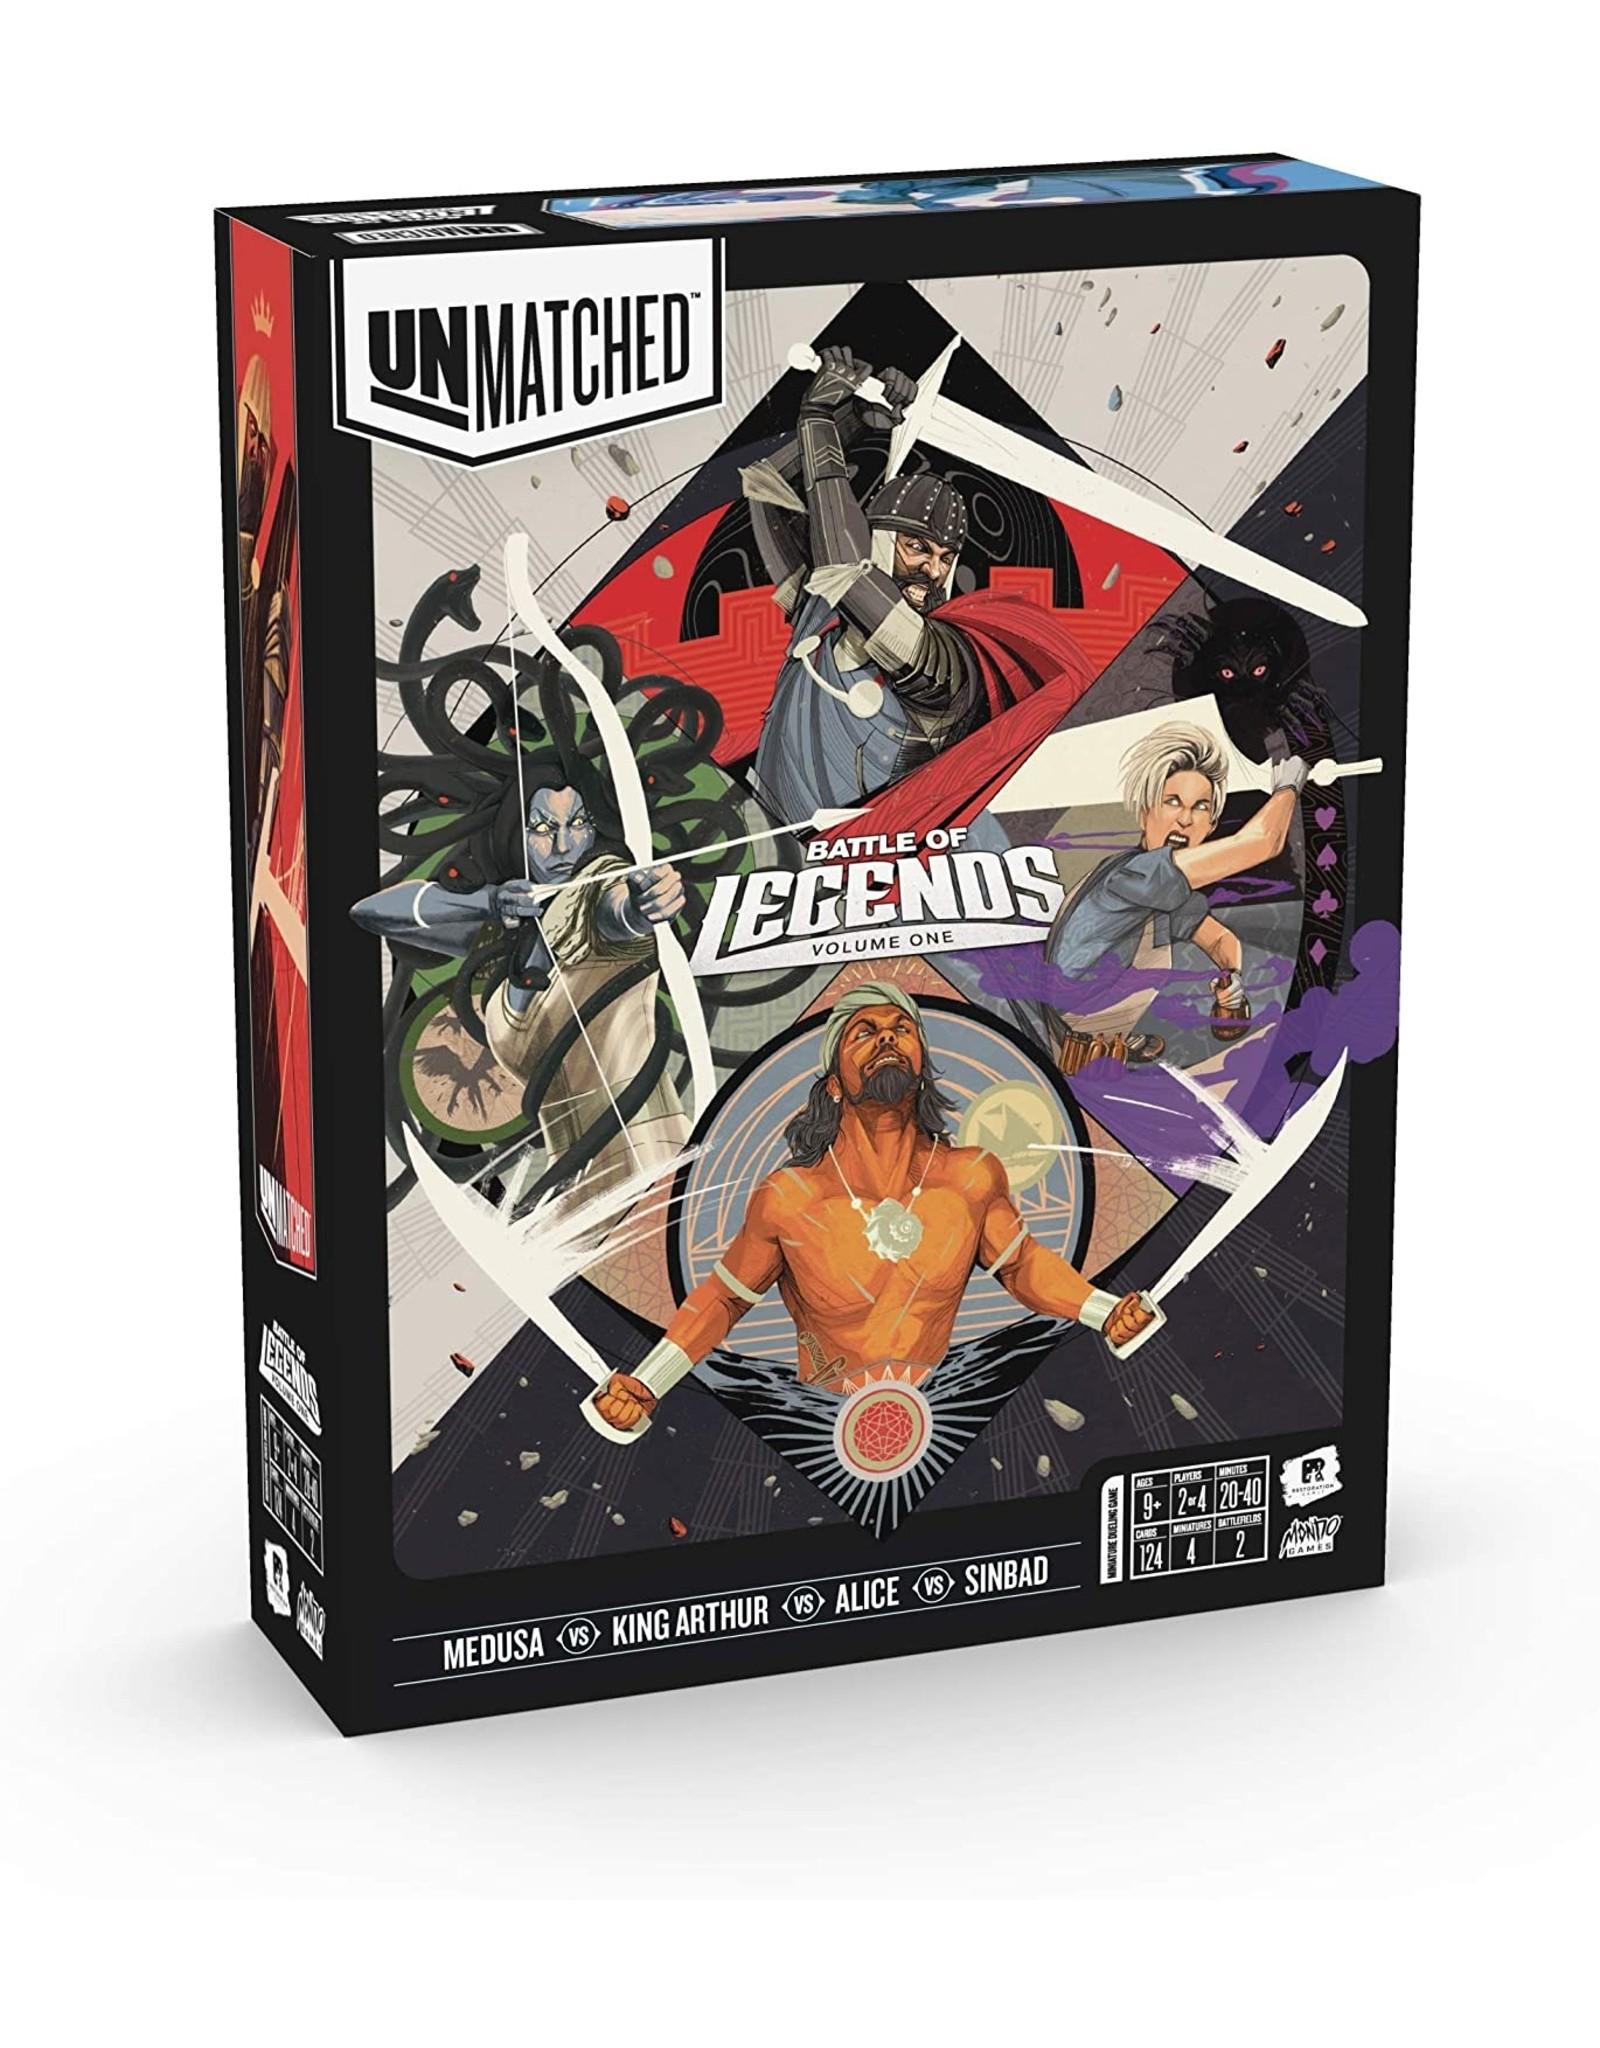 Unmatched Battle of Legends, Vol. 1